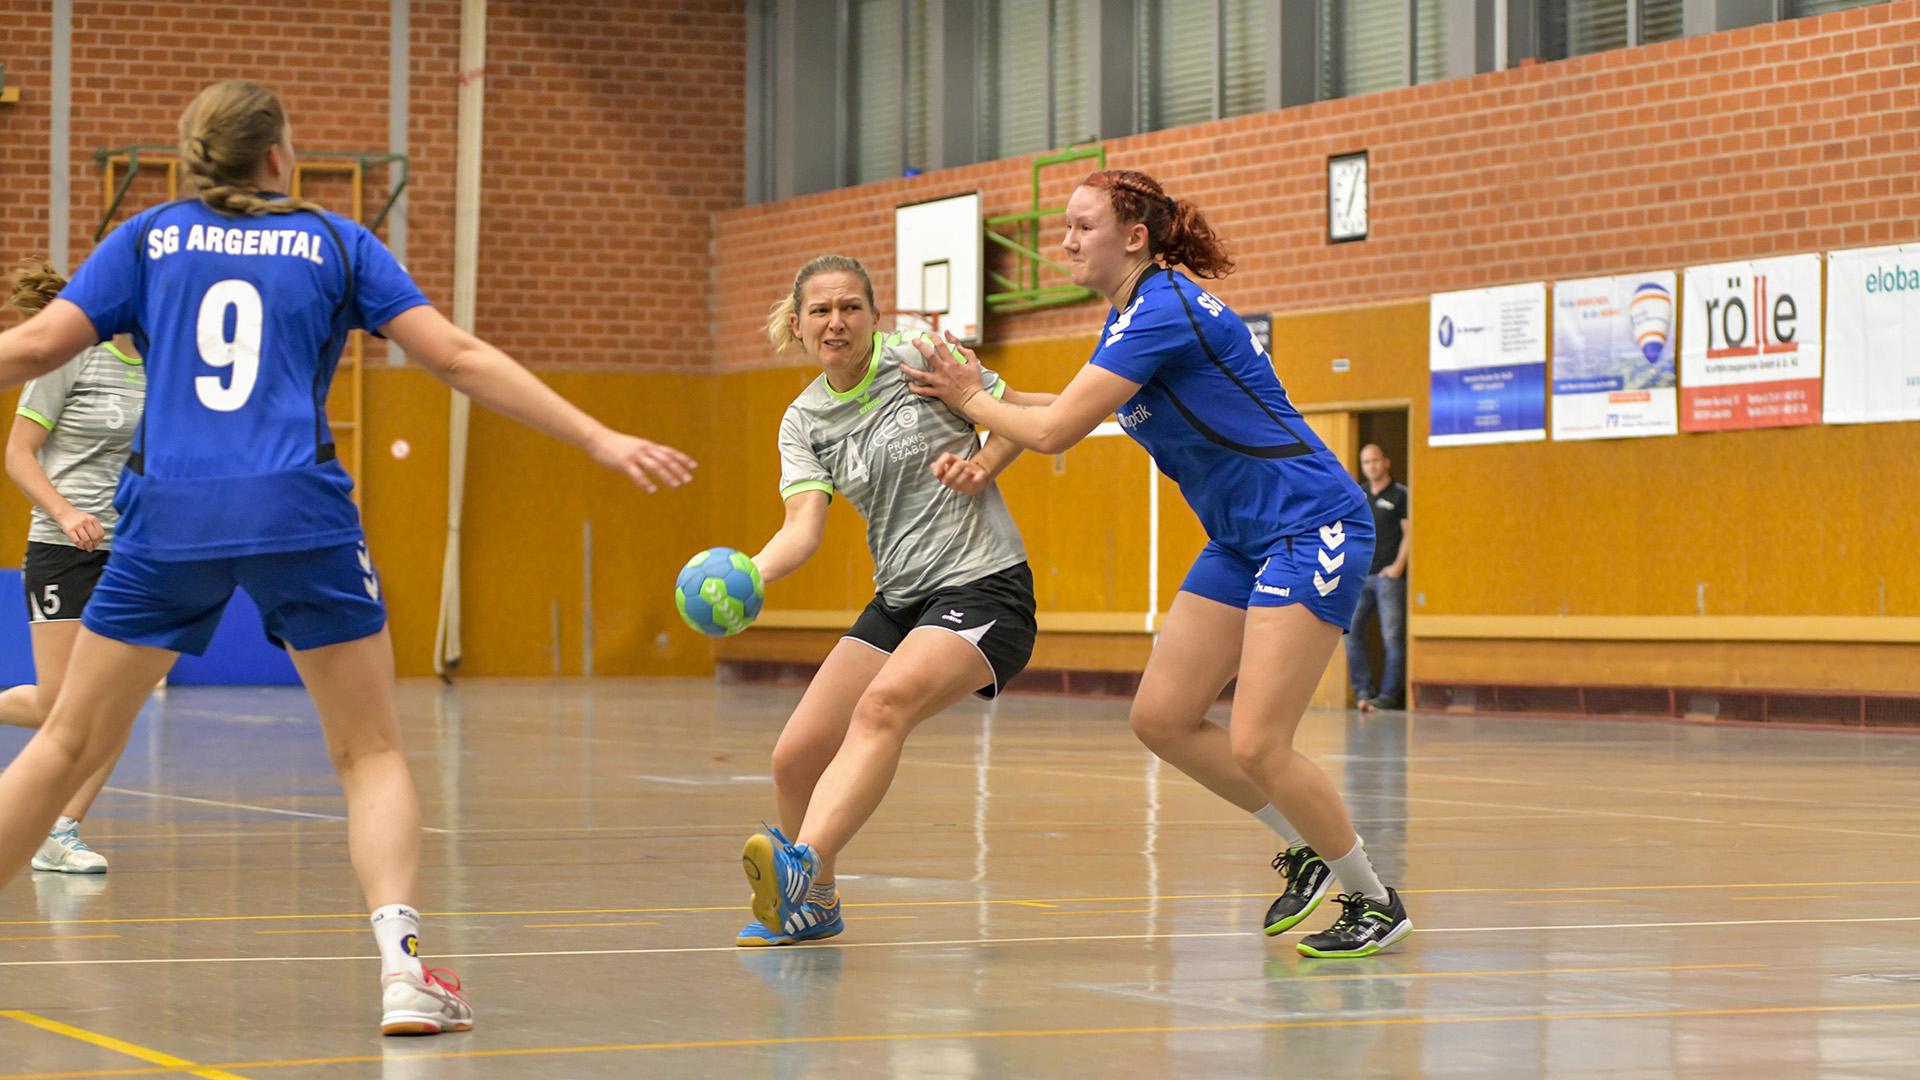 005Slider_Damen_tsg_leutkirch_handball